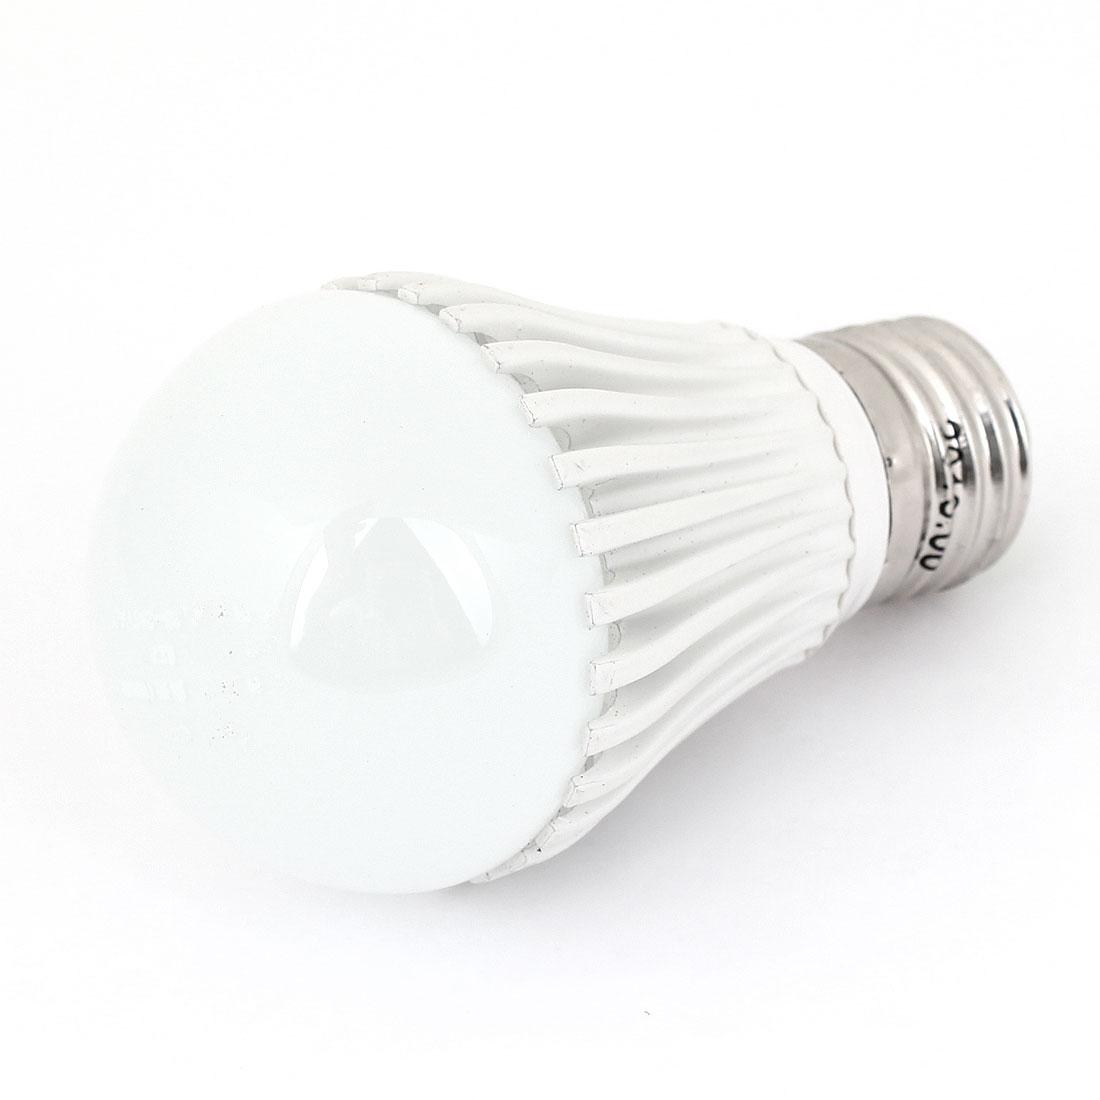 Kitchen Home E27 Screw Base White Light 10 LED Ball Bulb Lamp 5W AC 85V-265V